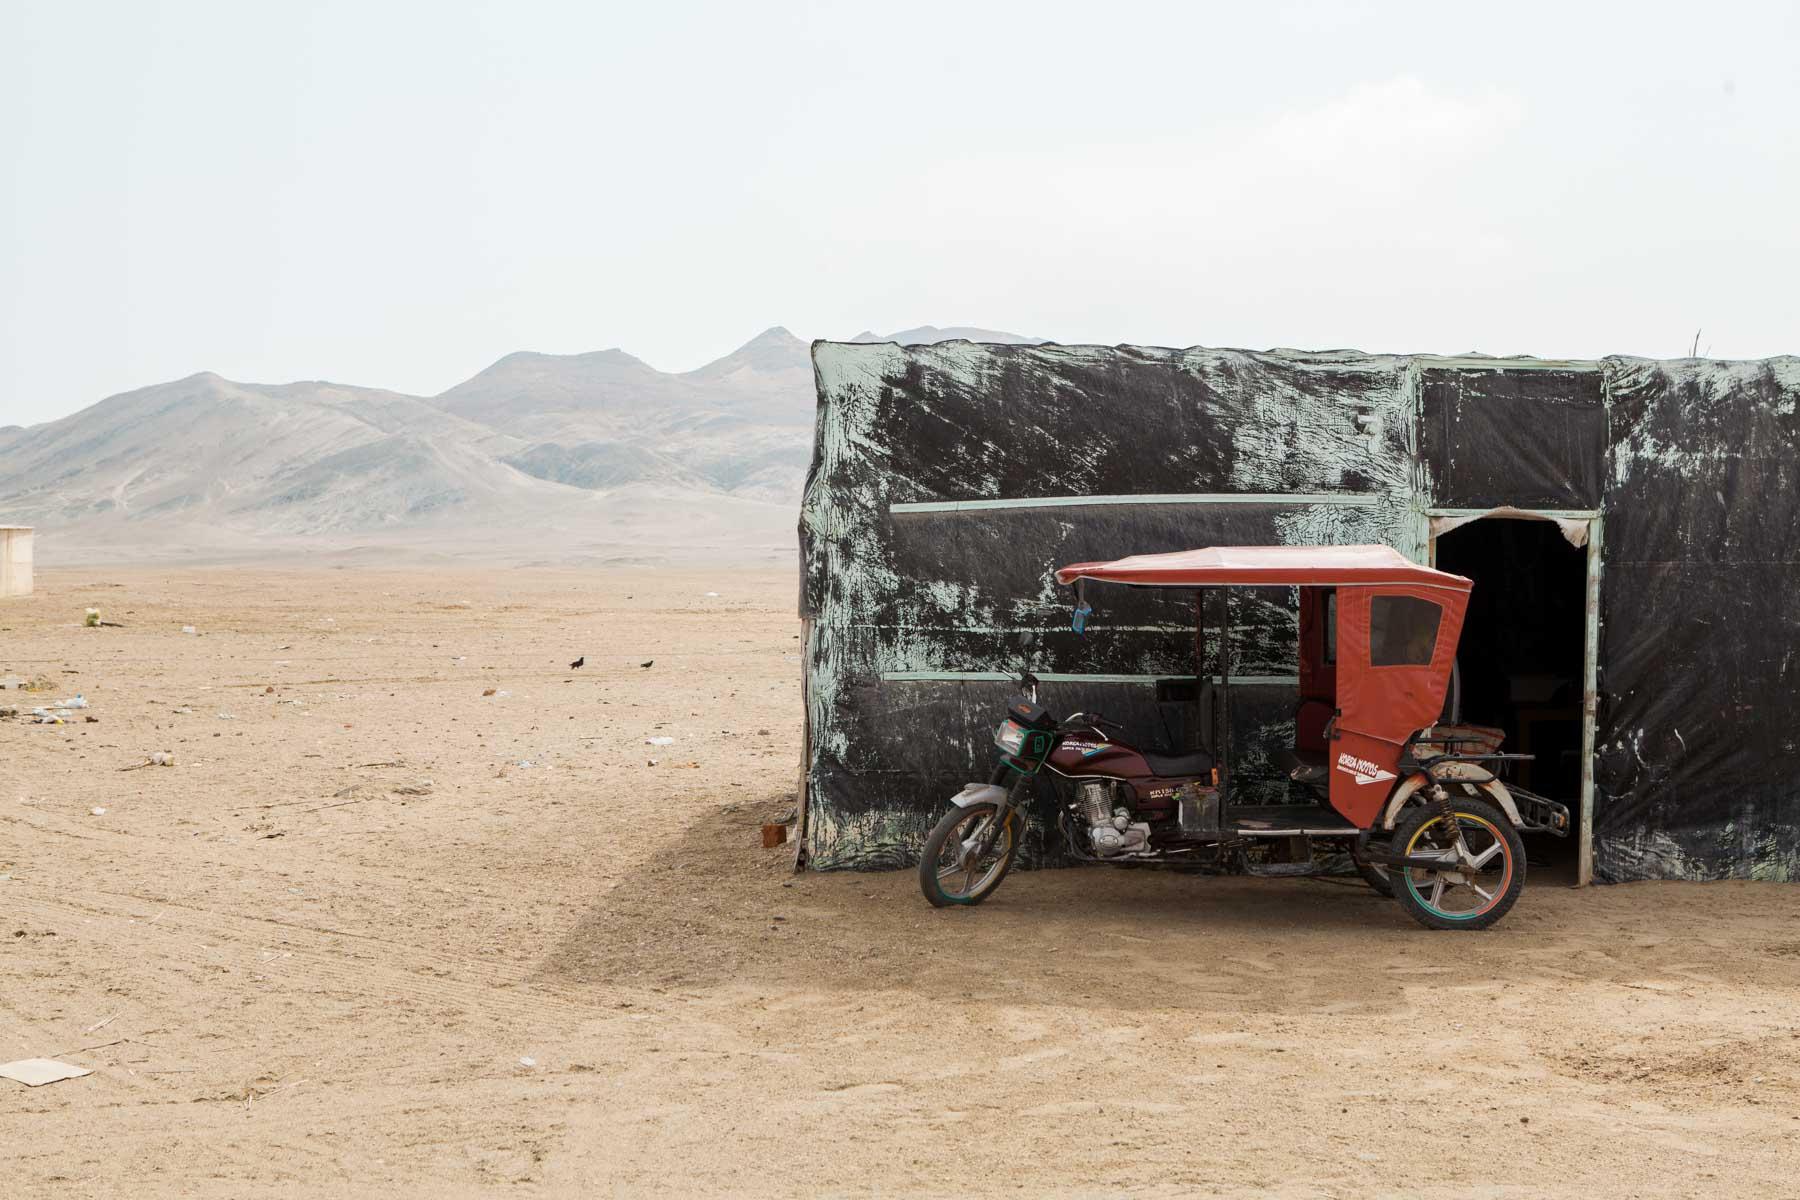 Real life, planet Jakku con moto-taxi.